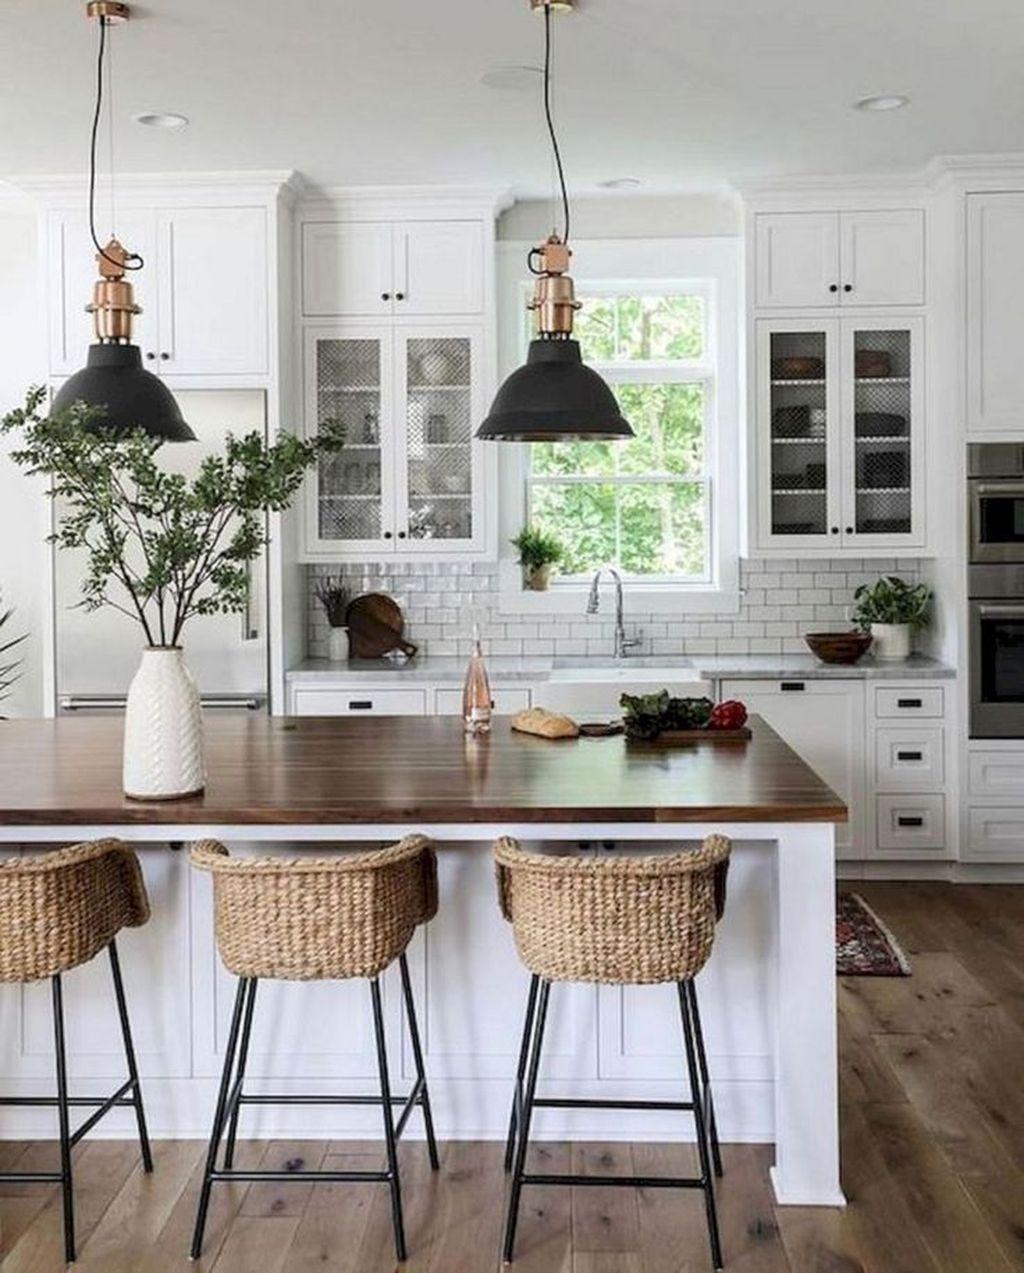 30 Classy Kitchen Decorating Ideas To Try This Year Kitchen Style Trendy Farmhouse Kitchen Kitchen Design